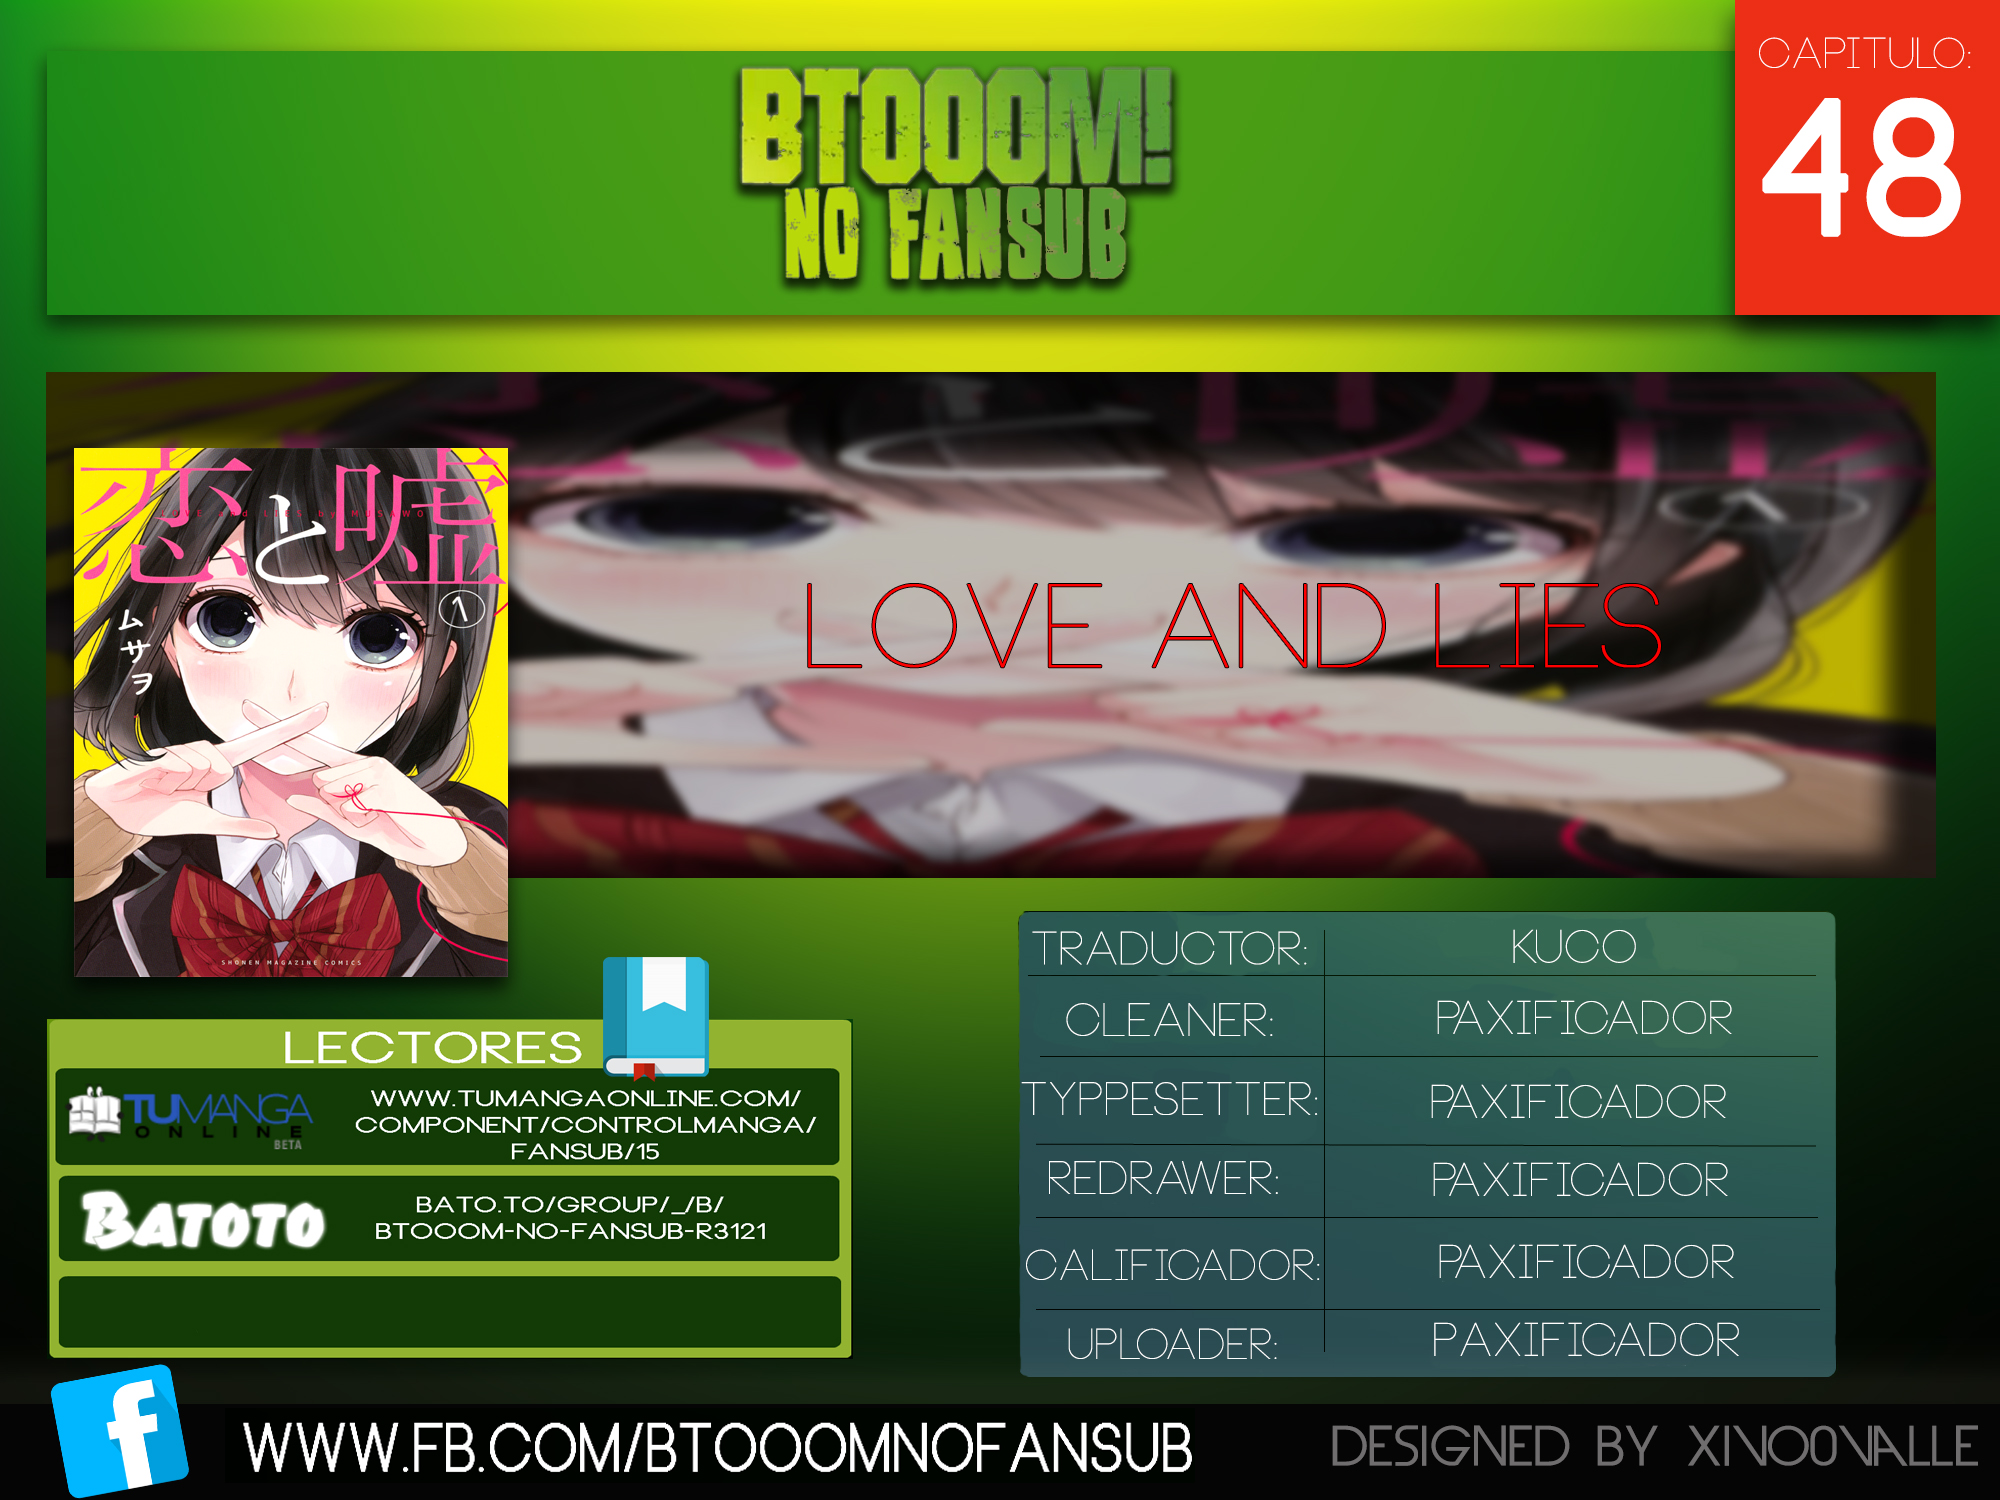 http://c5.ninemanga.com/es_manga/14/14734/392944/56e1930307652e14afbc3e75b8e54bdd.jpg Page 1